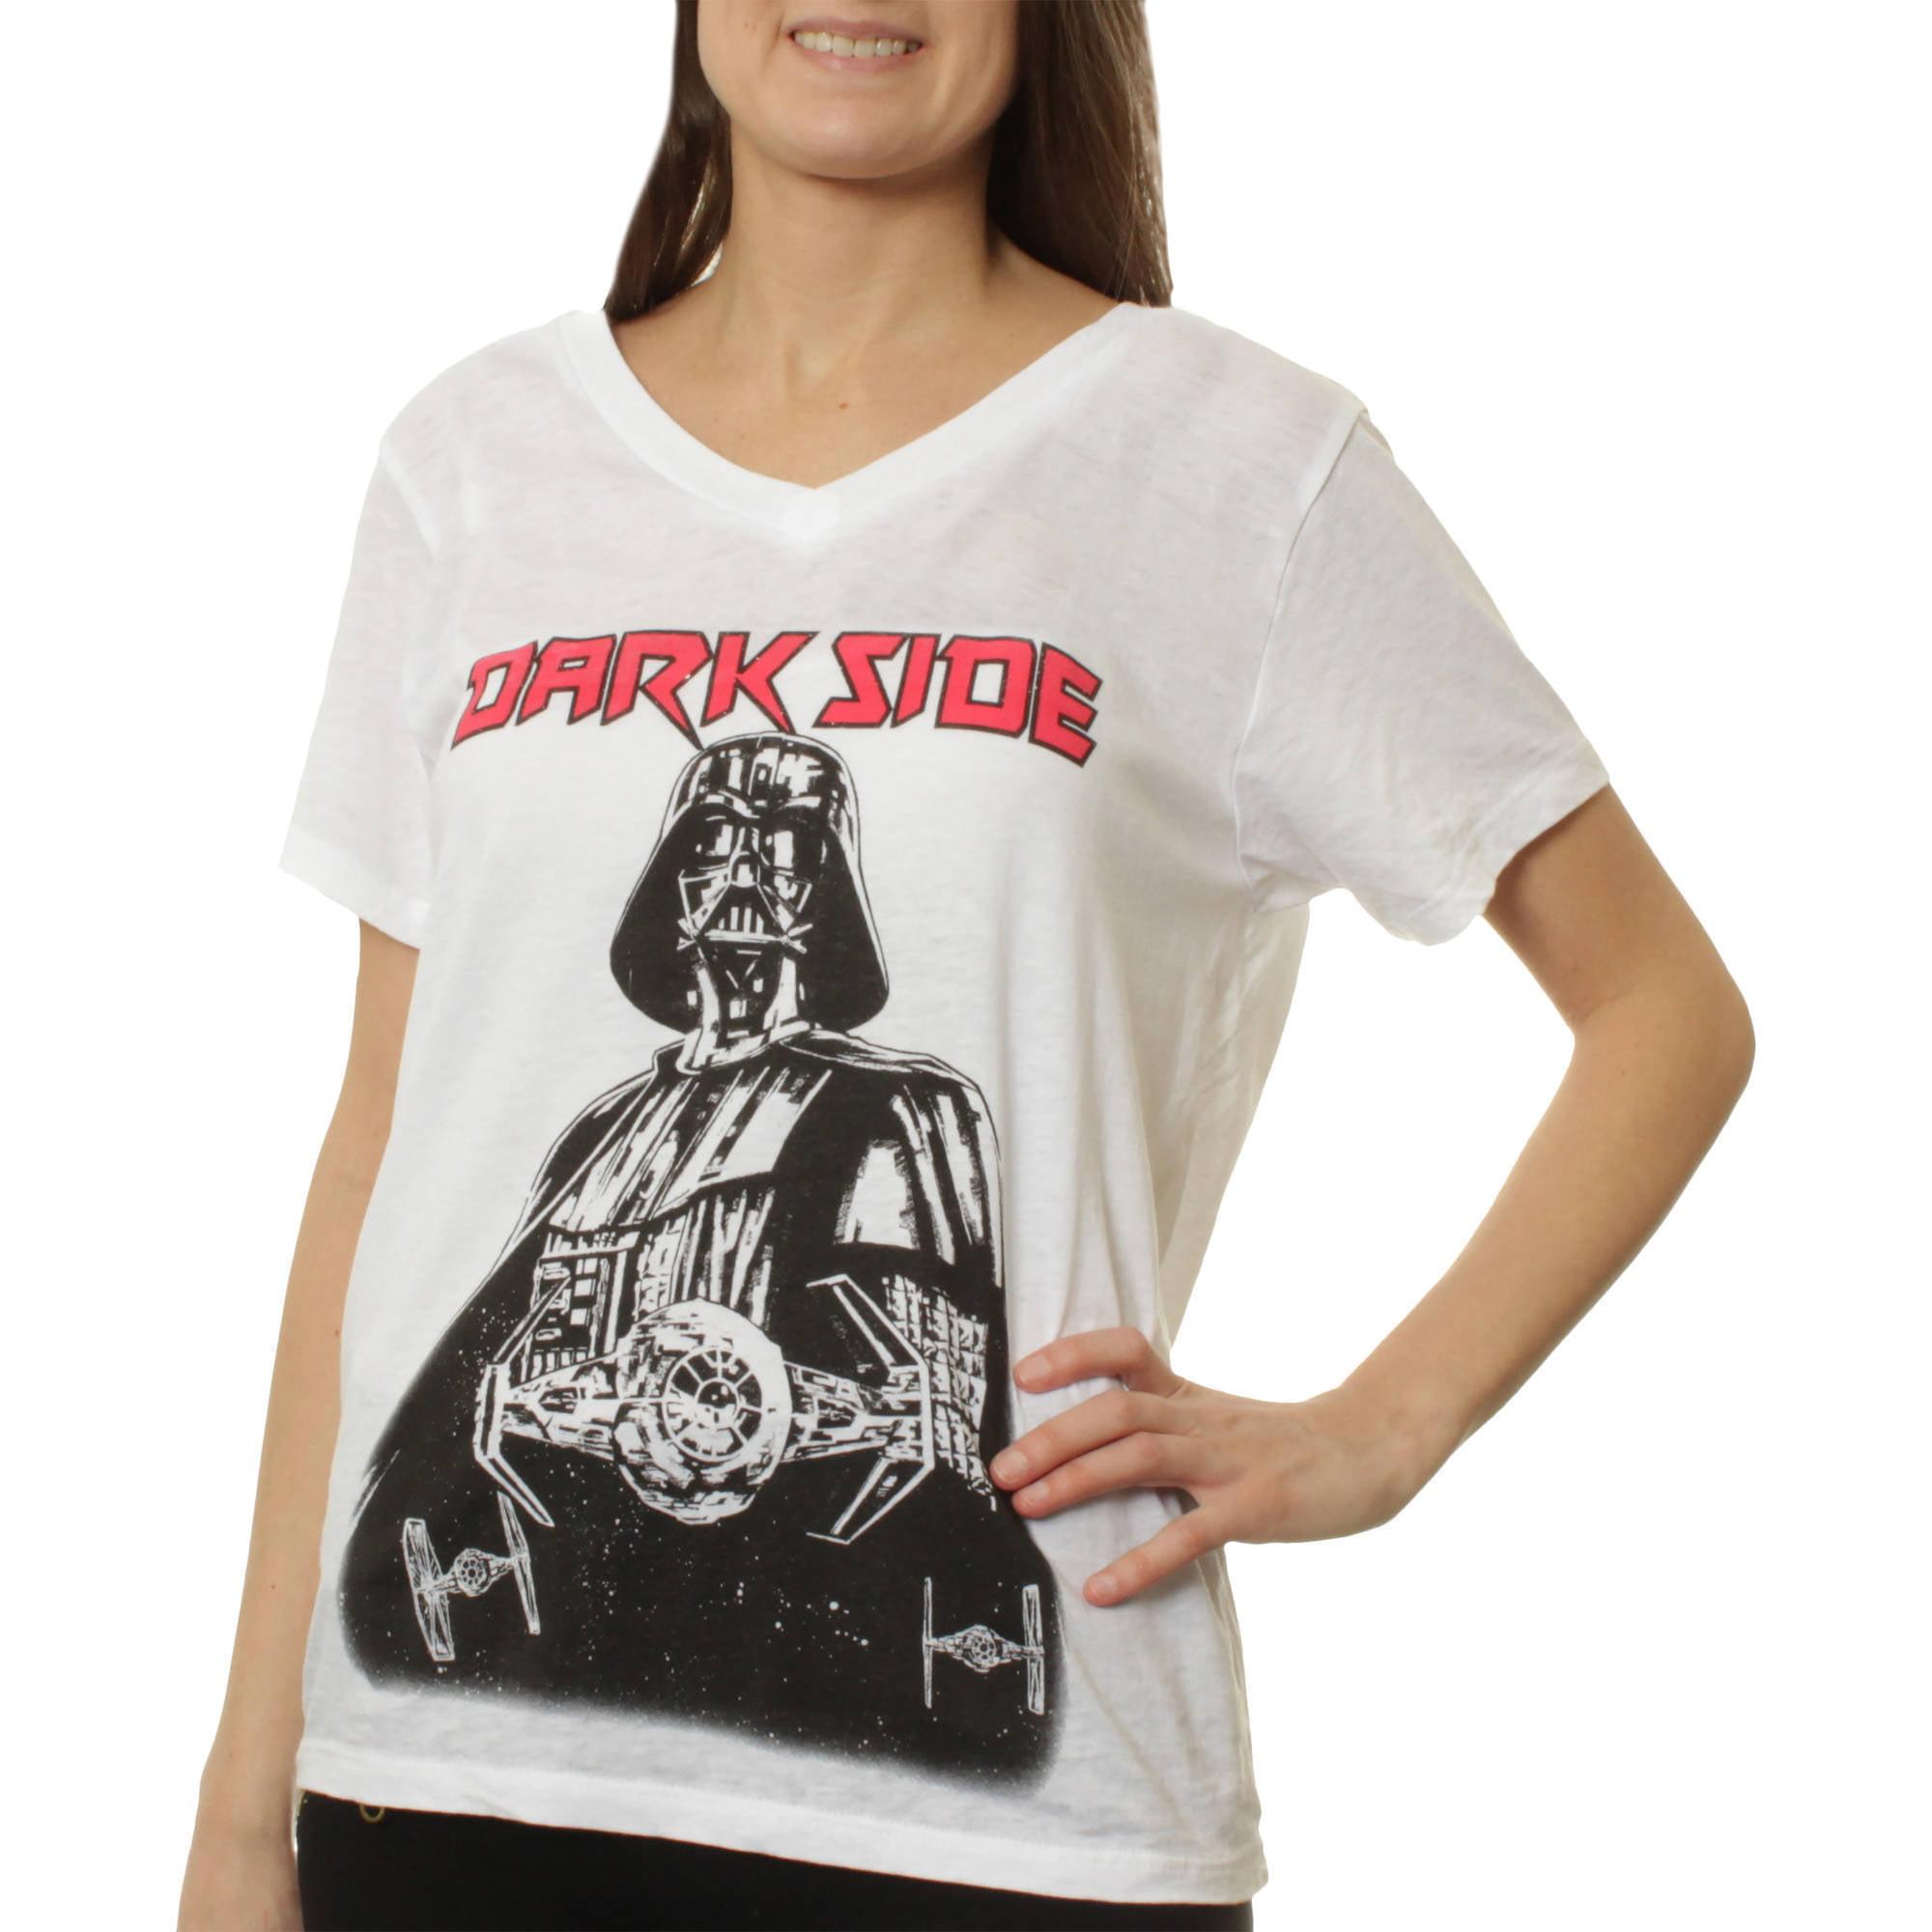 Darth Vader Dark Side Women's Burnout Short Sleeve Graphic Tee T-Shirt